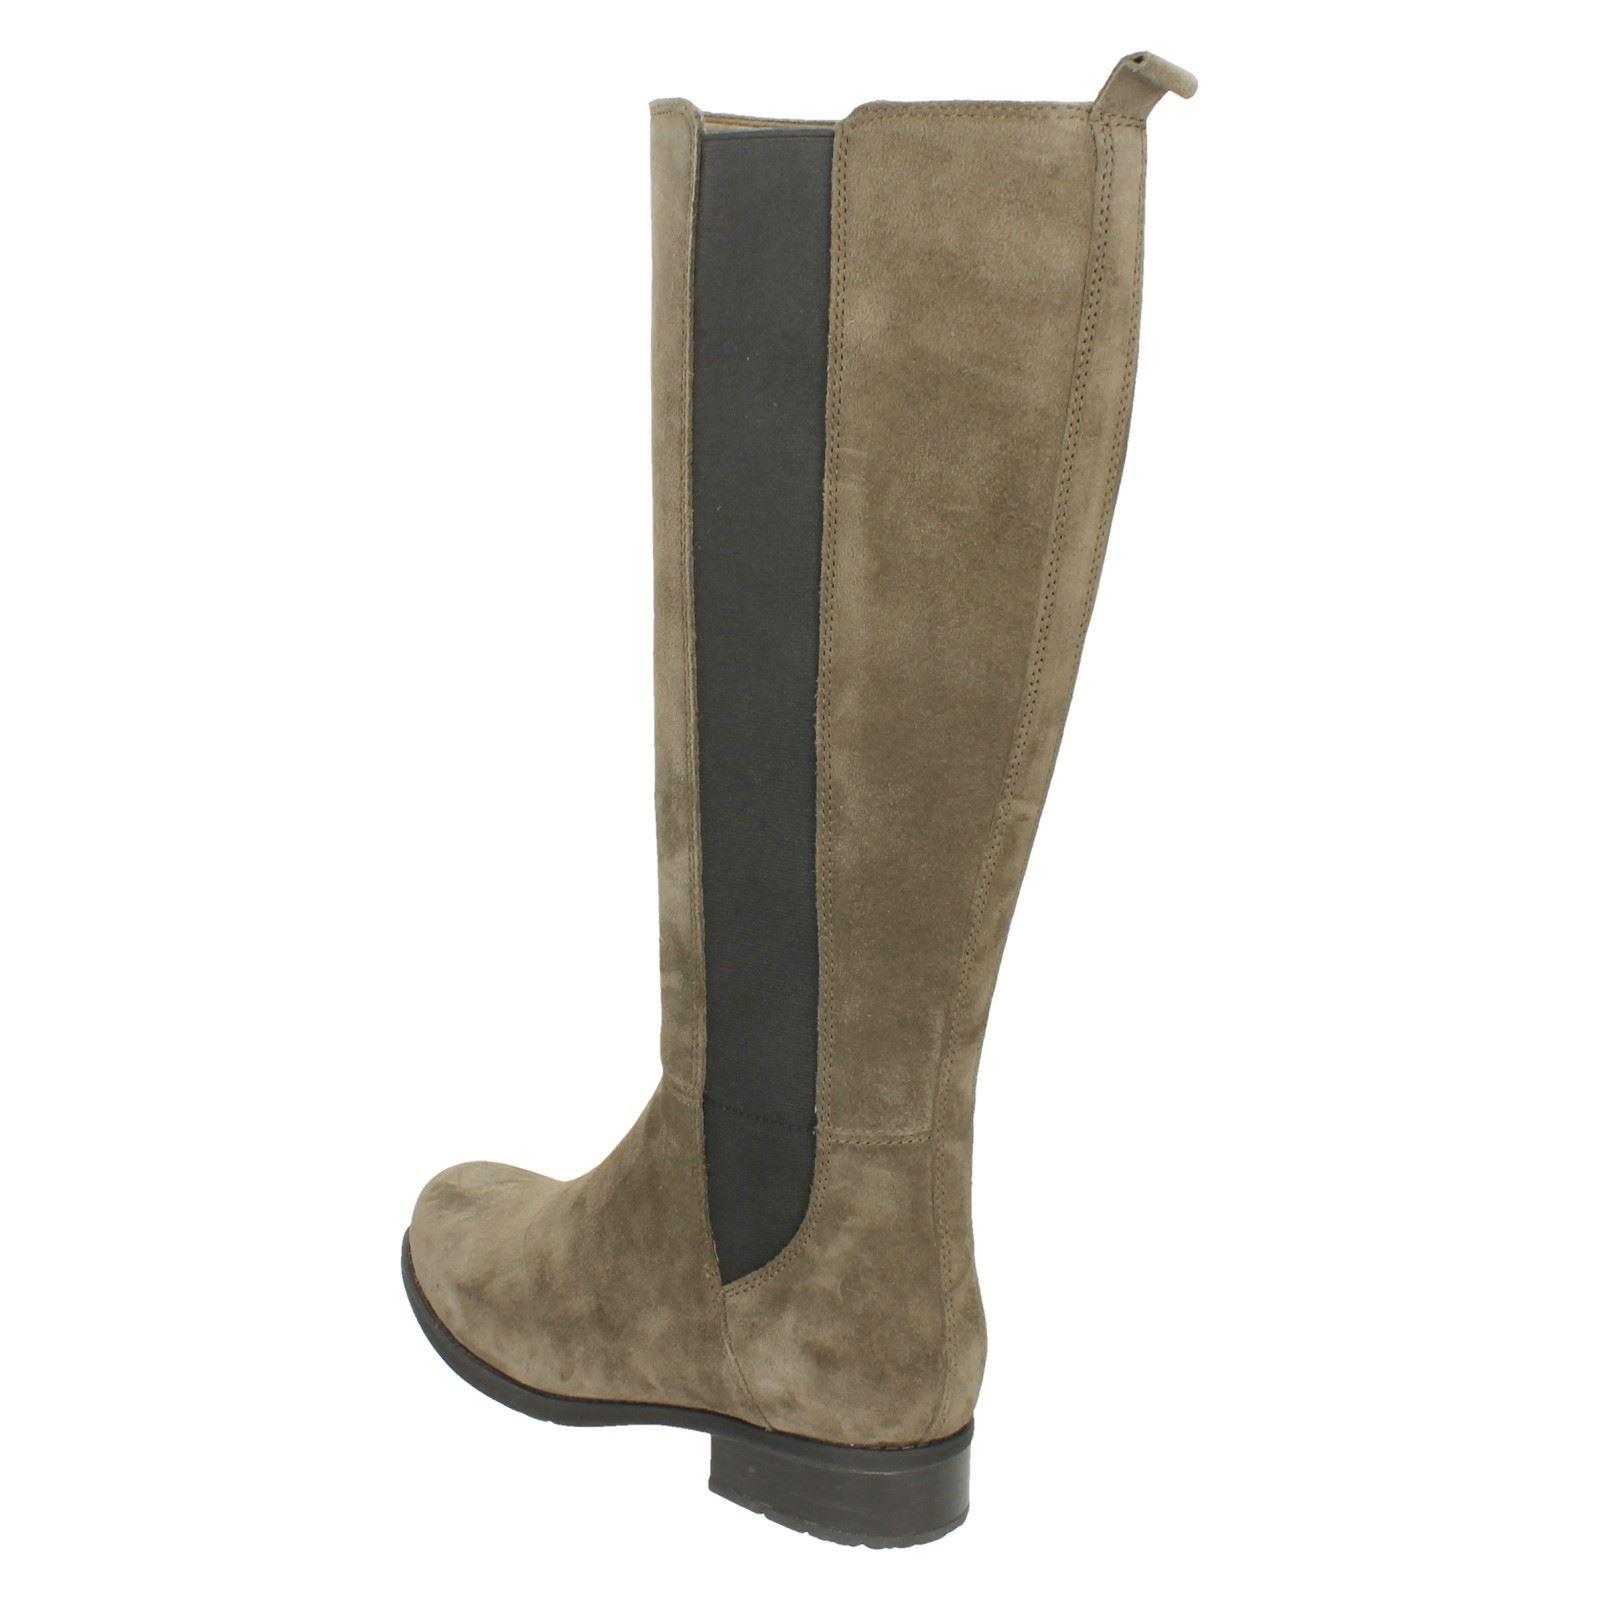 Mujer Clarks Elegante botas Altas ' Verlie Gail Gail Gail ' 43a013